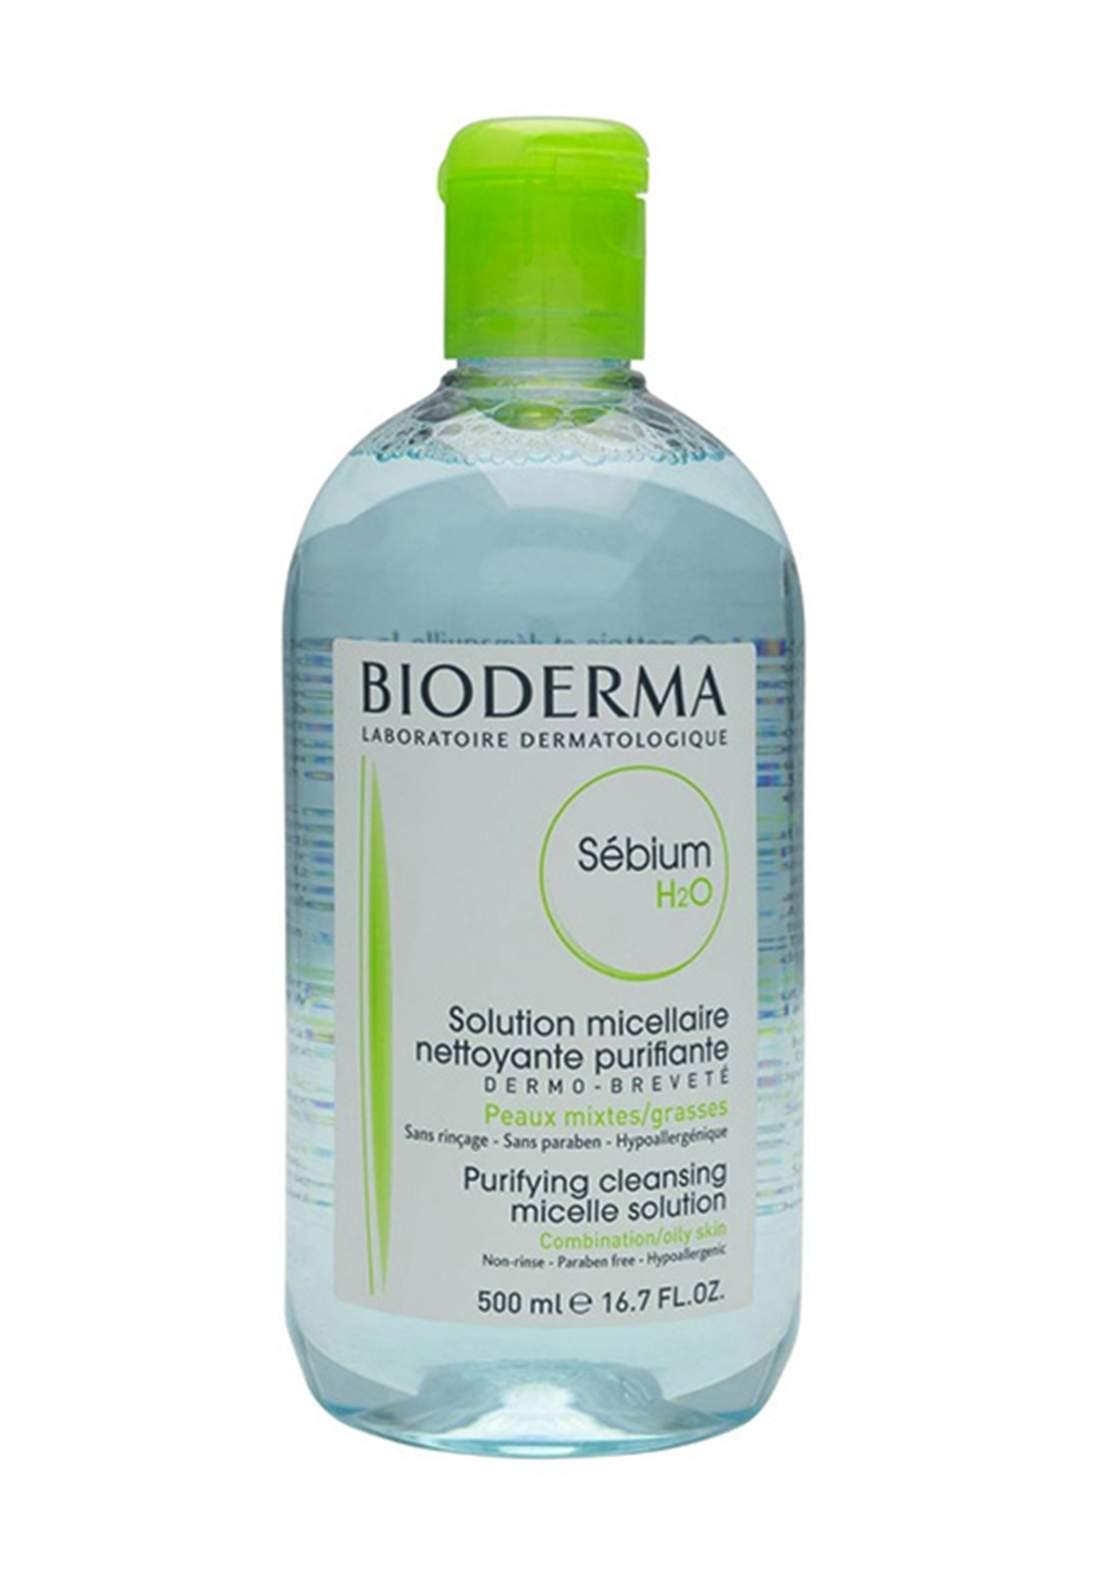 Bioderma Sebium H2O 500ml Micellaire مزيل مكياج